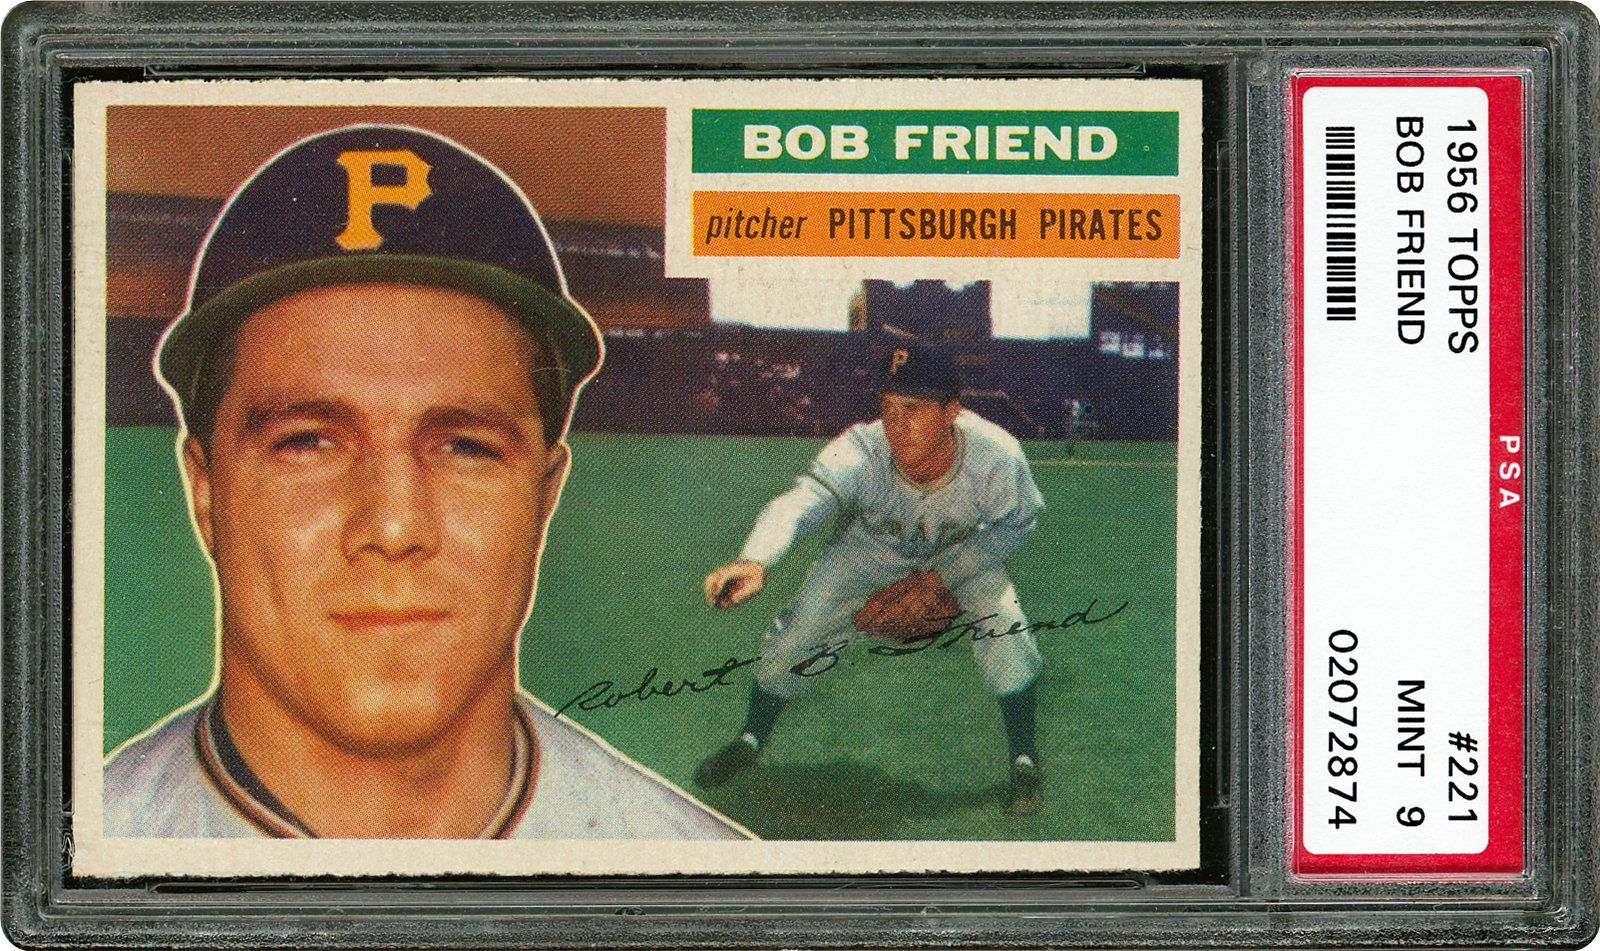 1956 Topps Bob Friend Psa Cardfacts